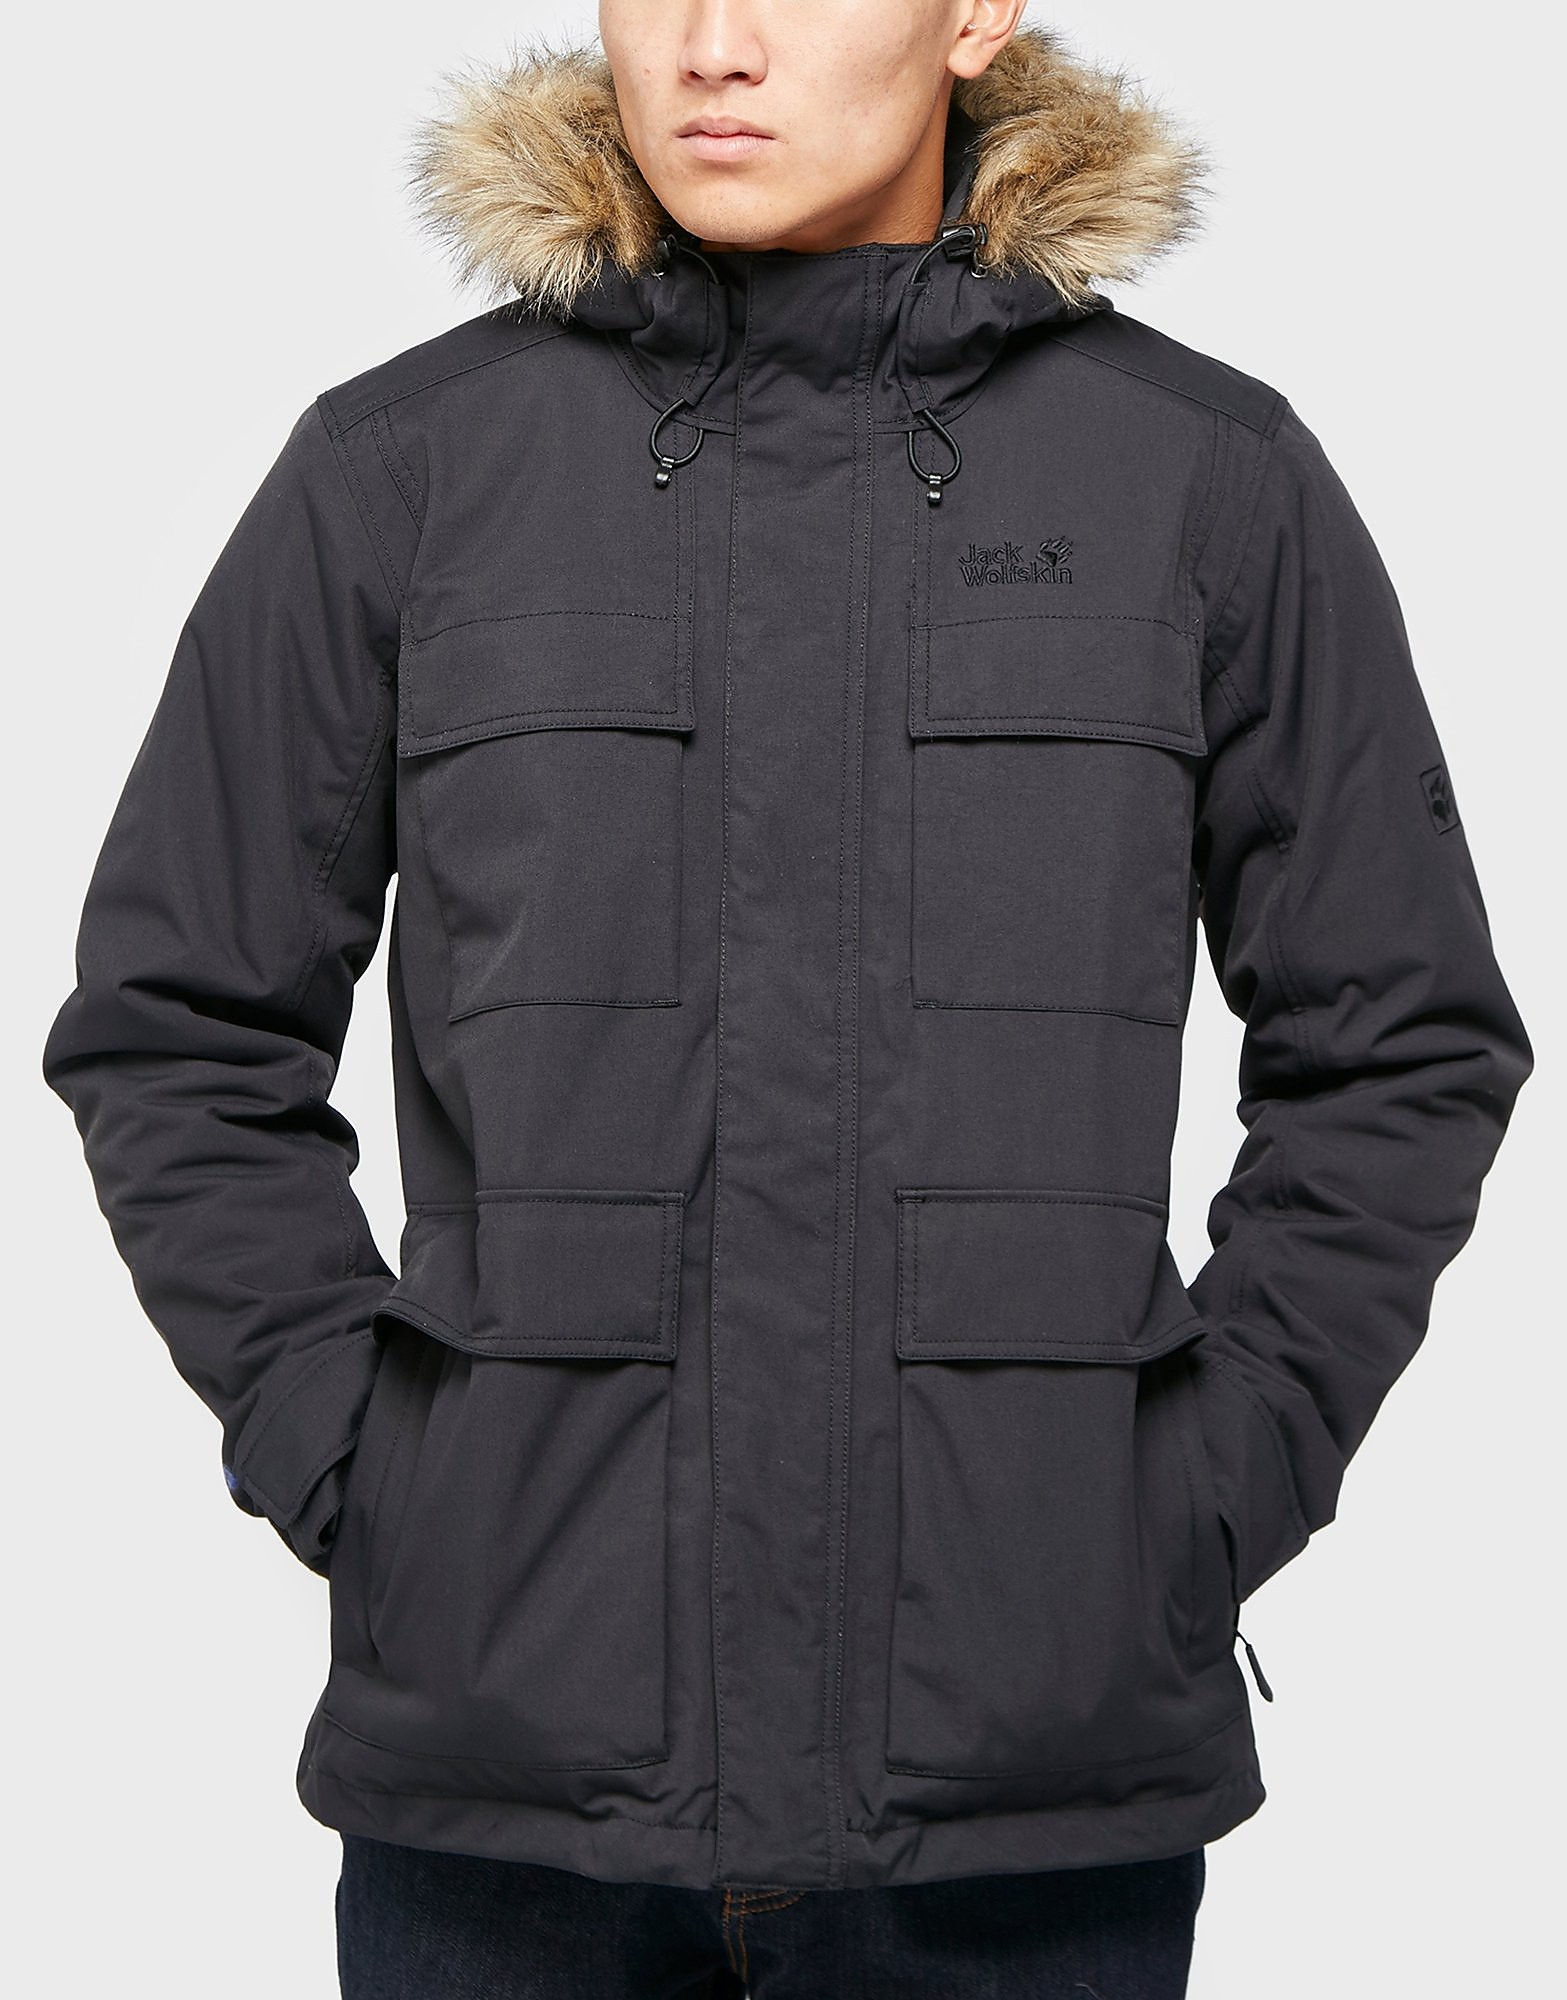 Jack Wolfskin Point Barrow Parka Jacket  Black Black